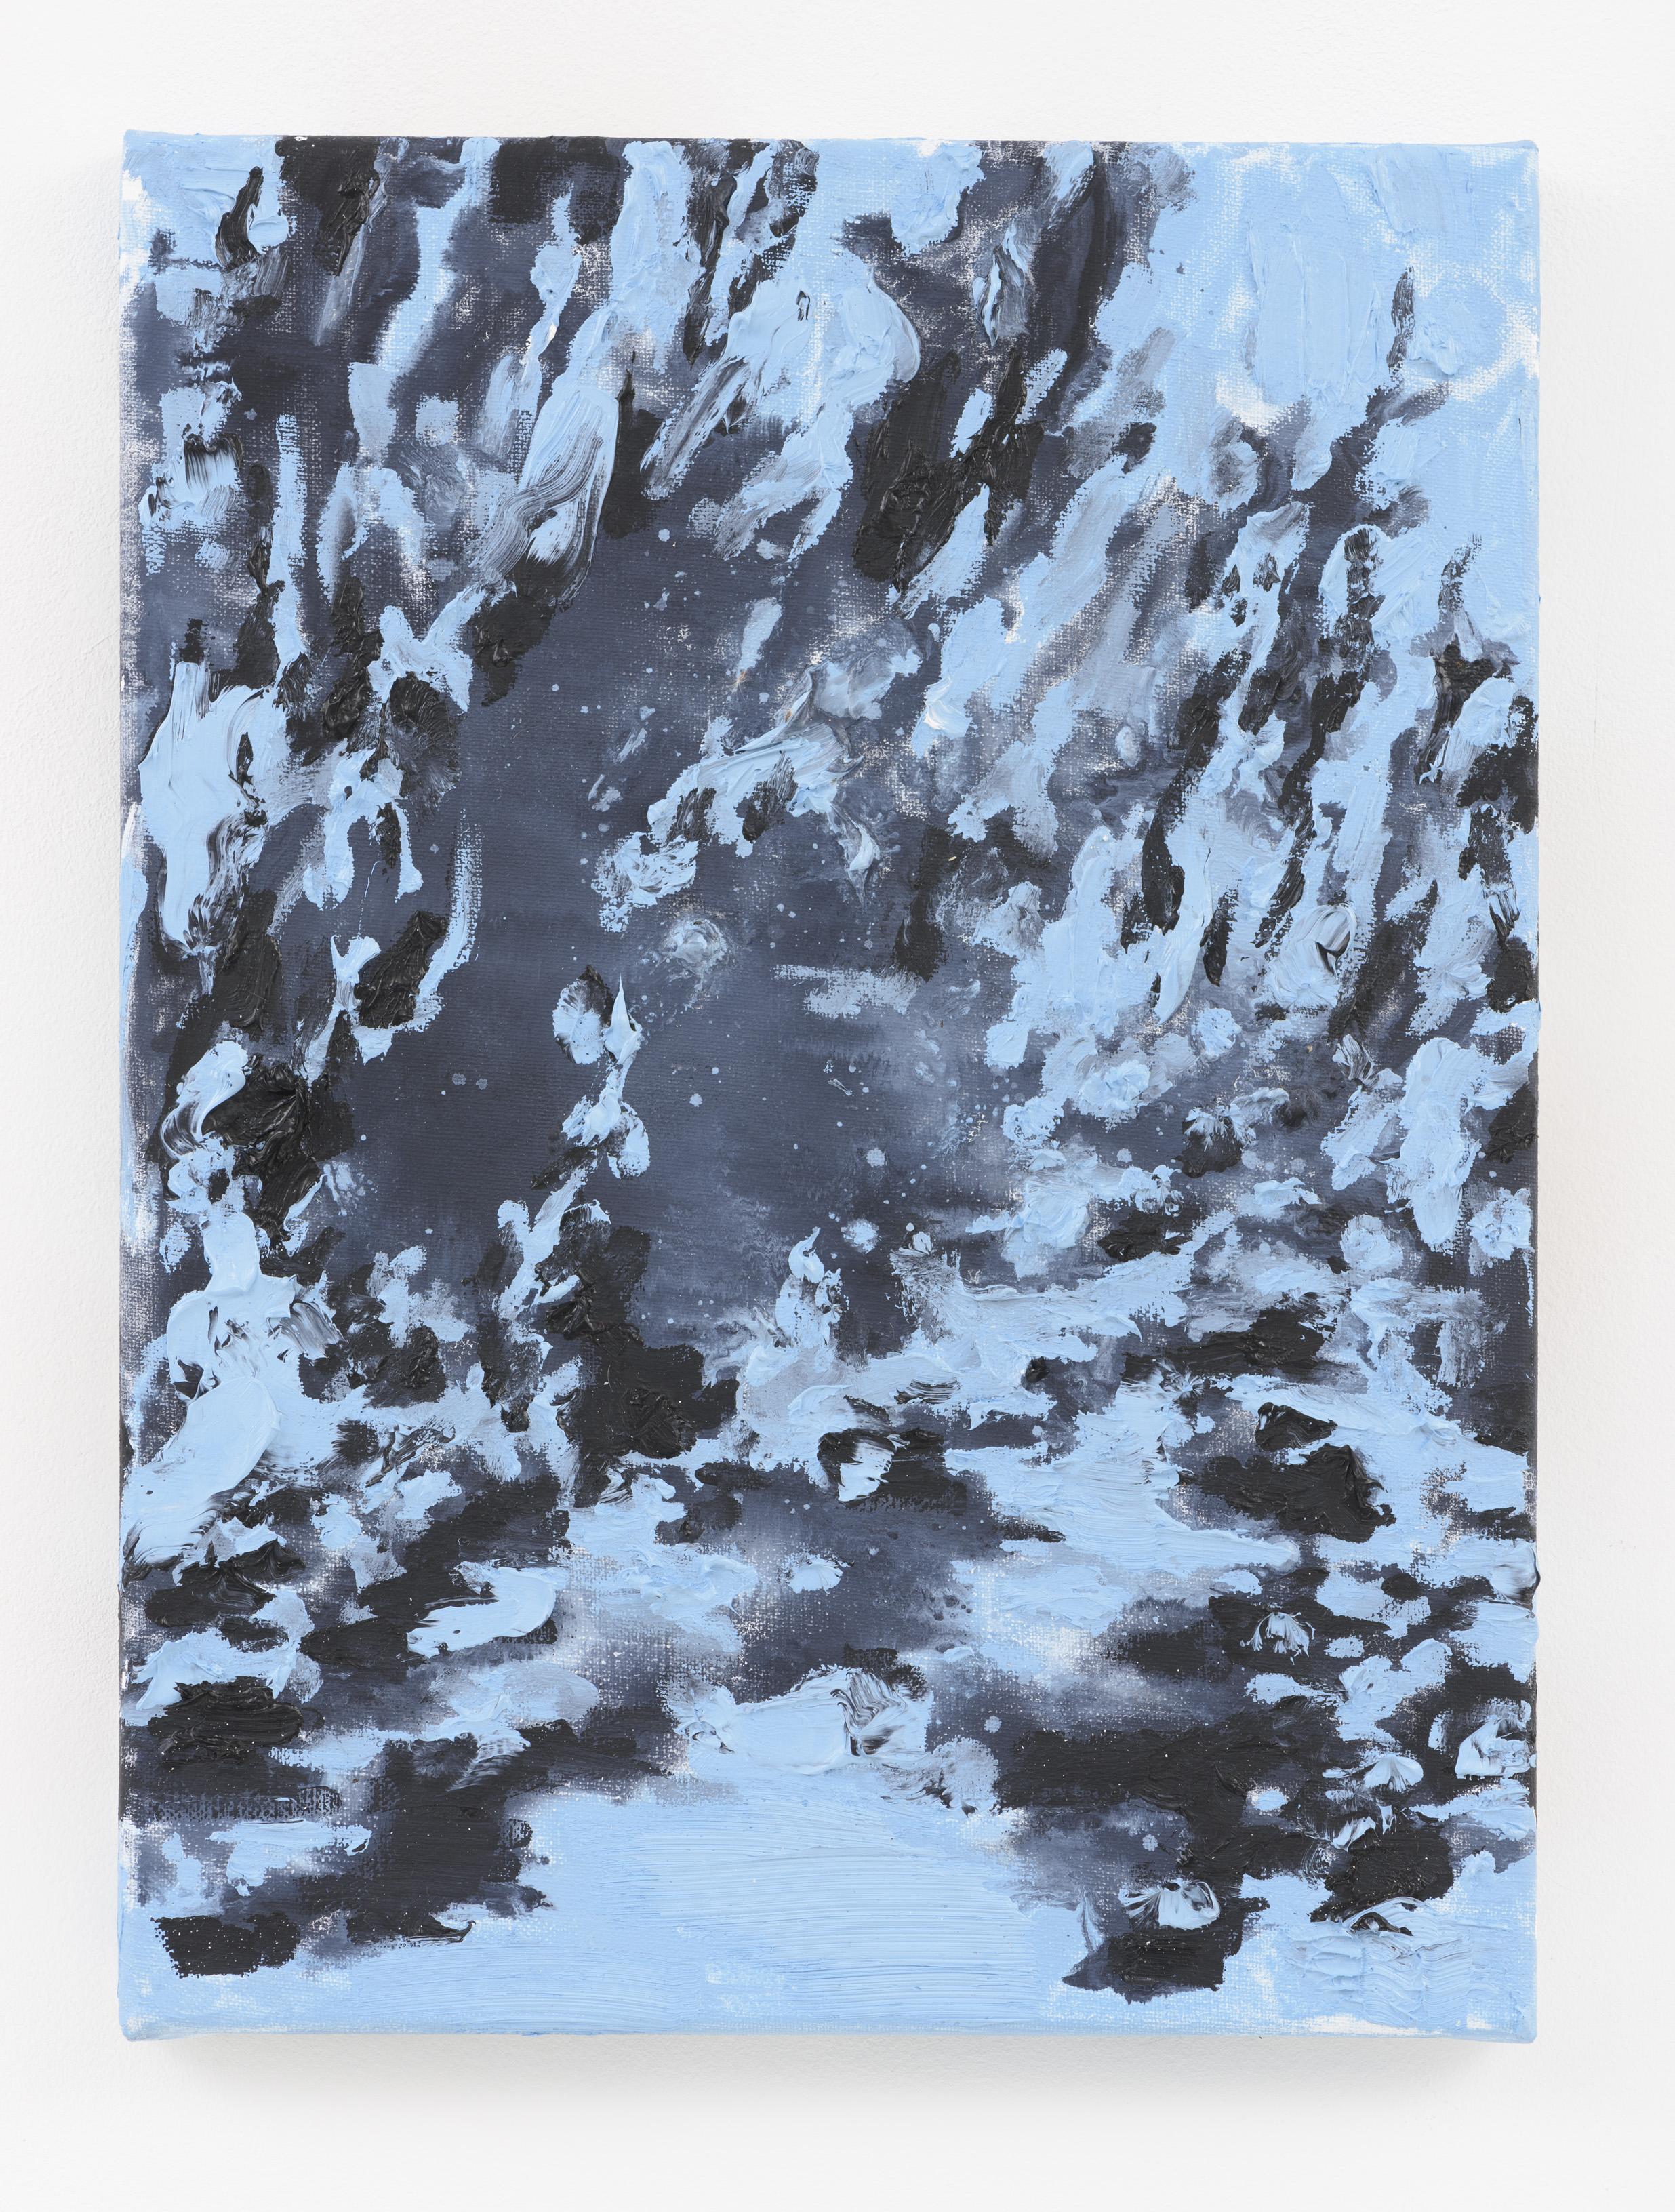 """Na Floresta Azul"" 40 x 30 cm. oil on linen 2015"